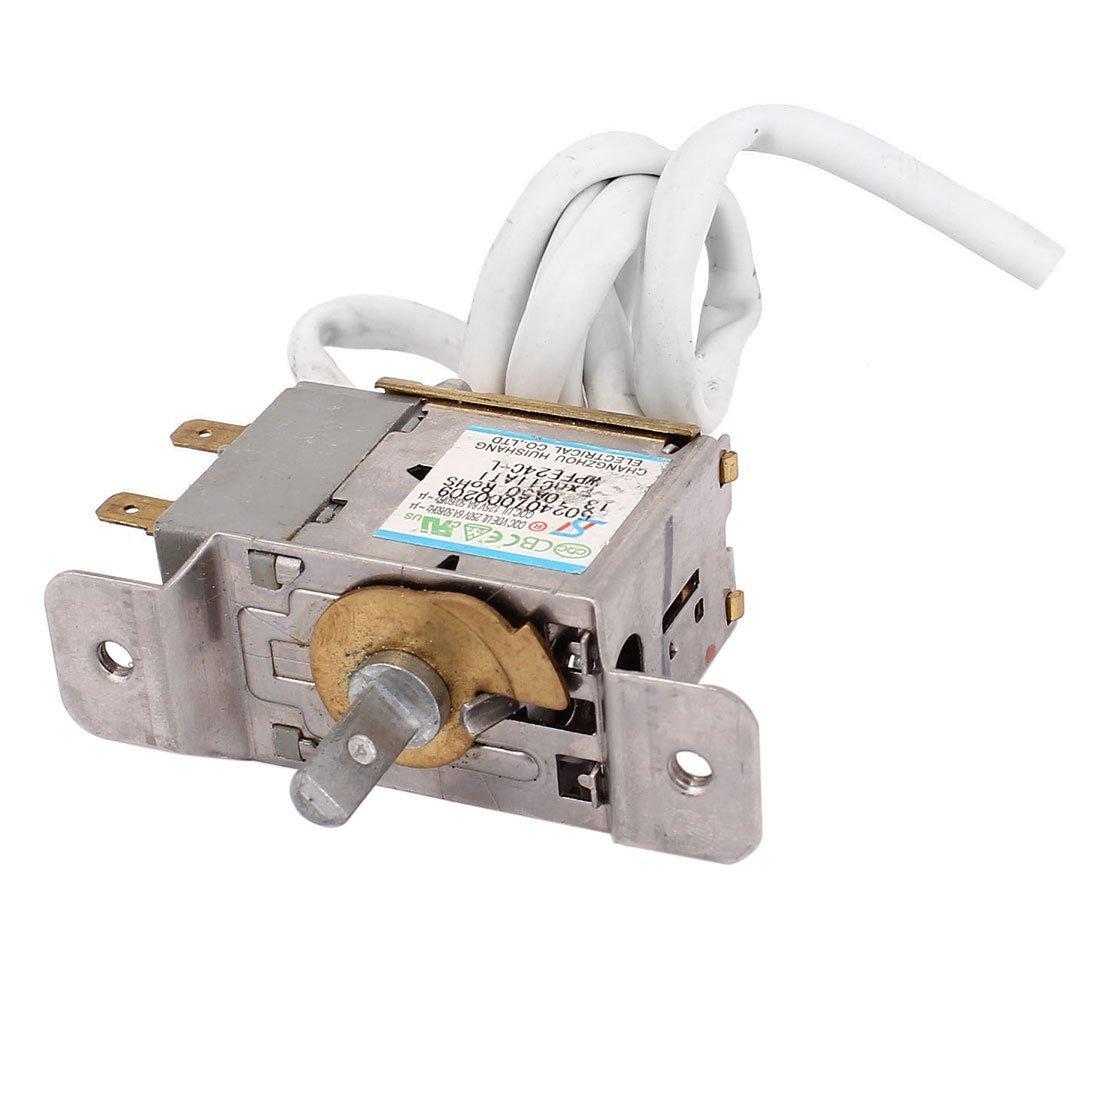 uxcell AC 125/250V 8A/6A Freezer Refrigerator Refrigeration Cooler Temperature Controller